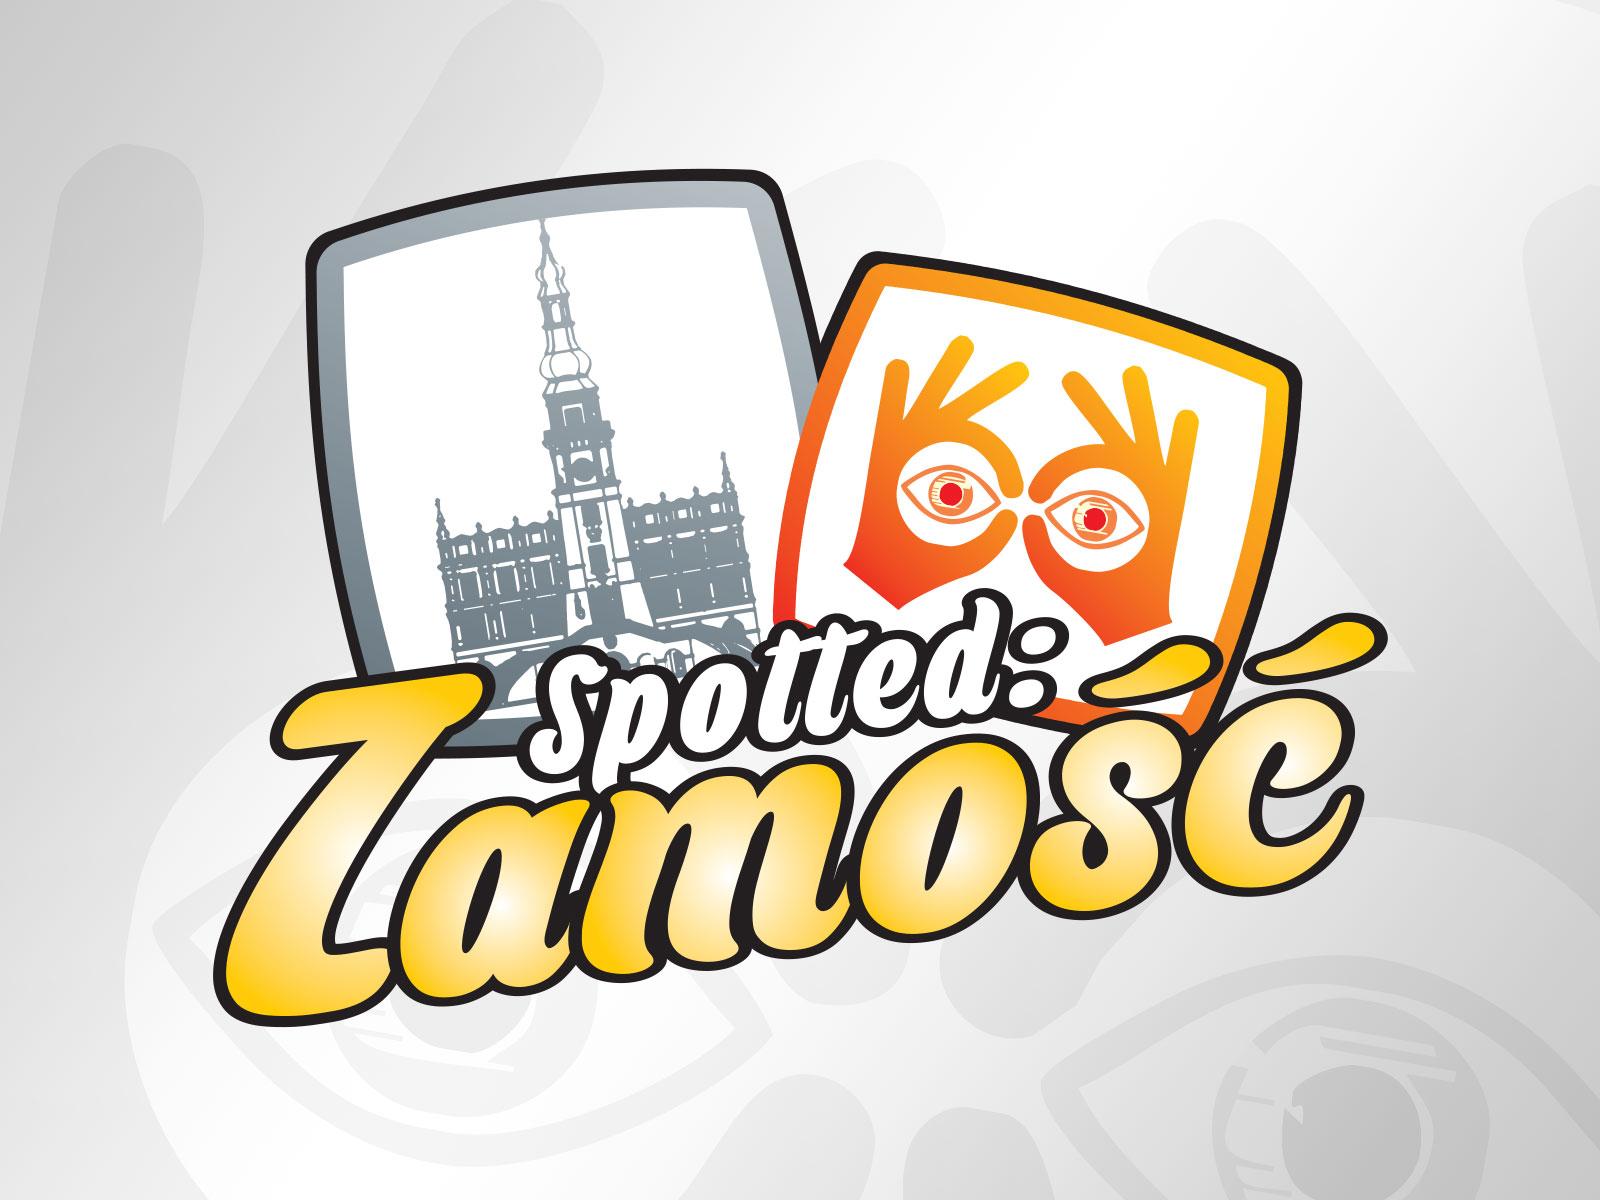 Logo Spotted Zamość